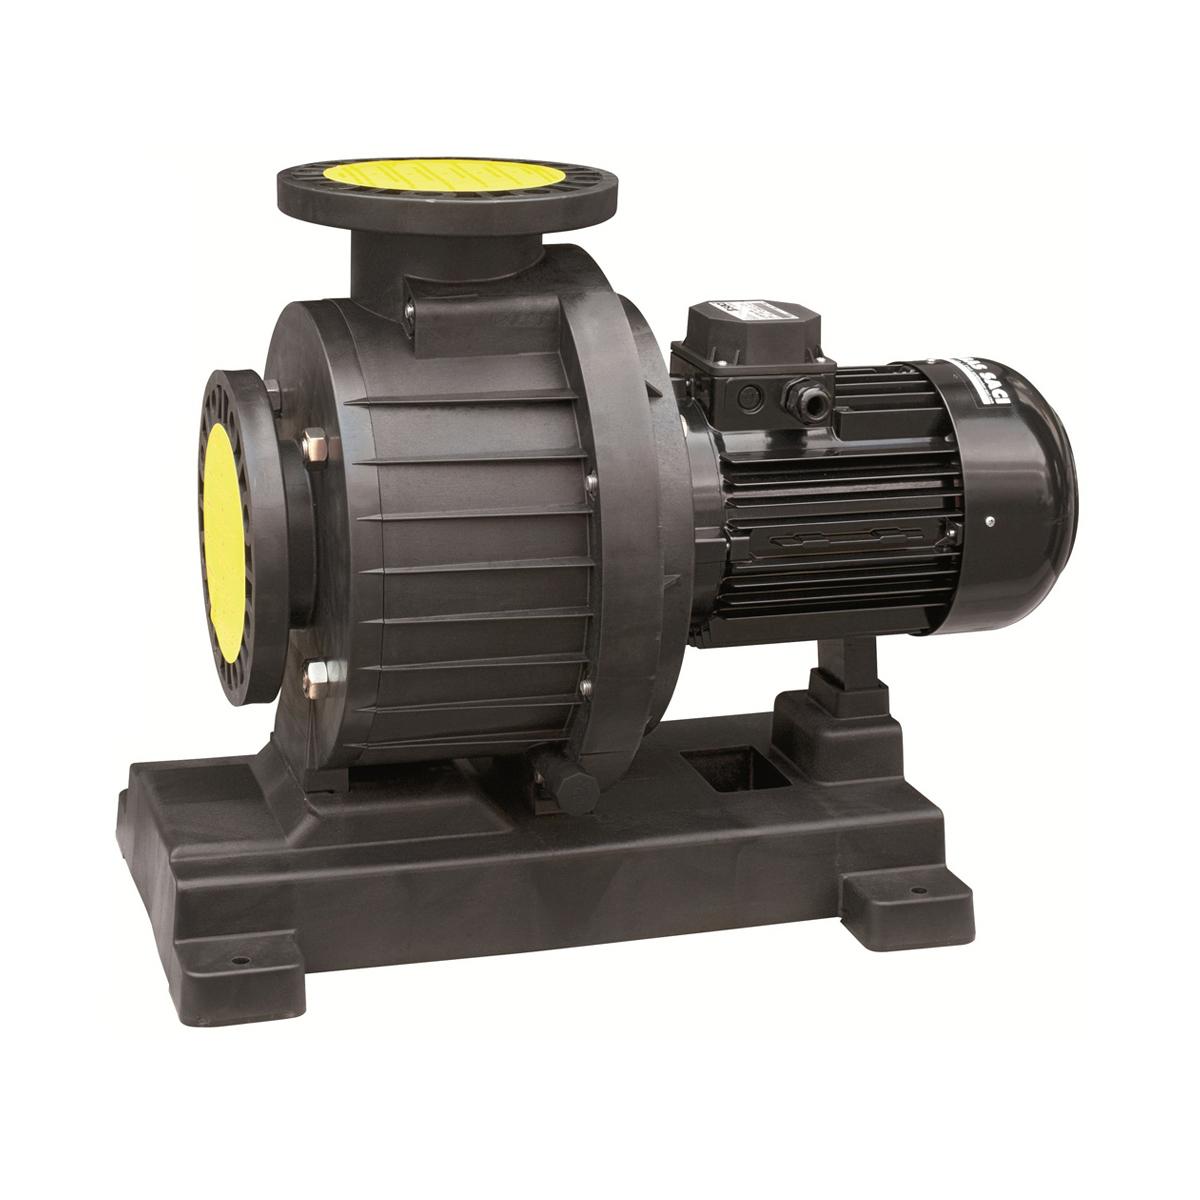 Smart Filterpumpe Serie K 300 230-400V, 1450 U/min 2,2 kW, 3 HP, 43 m³/h bei 10m Smart Filterpumpe Serie K 300 230-400V, 1450 U/min 2,2 kW, 3 HP, 43 m³/h bei 10m